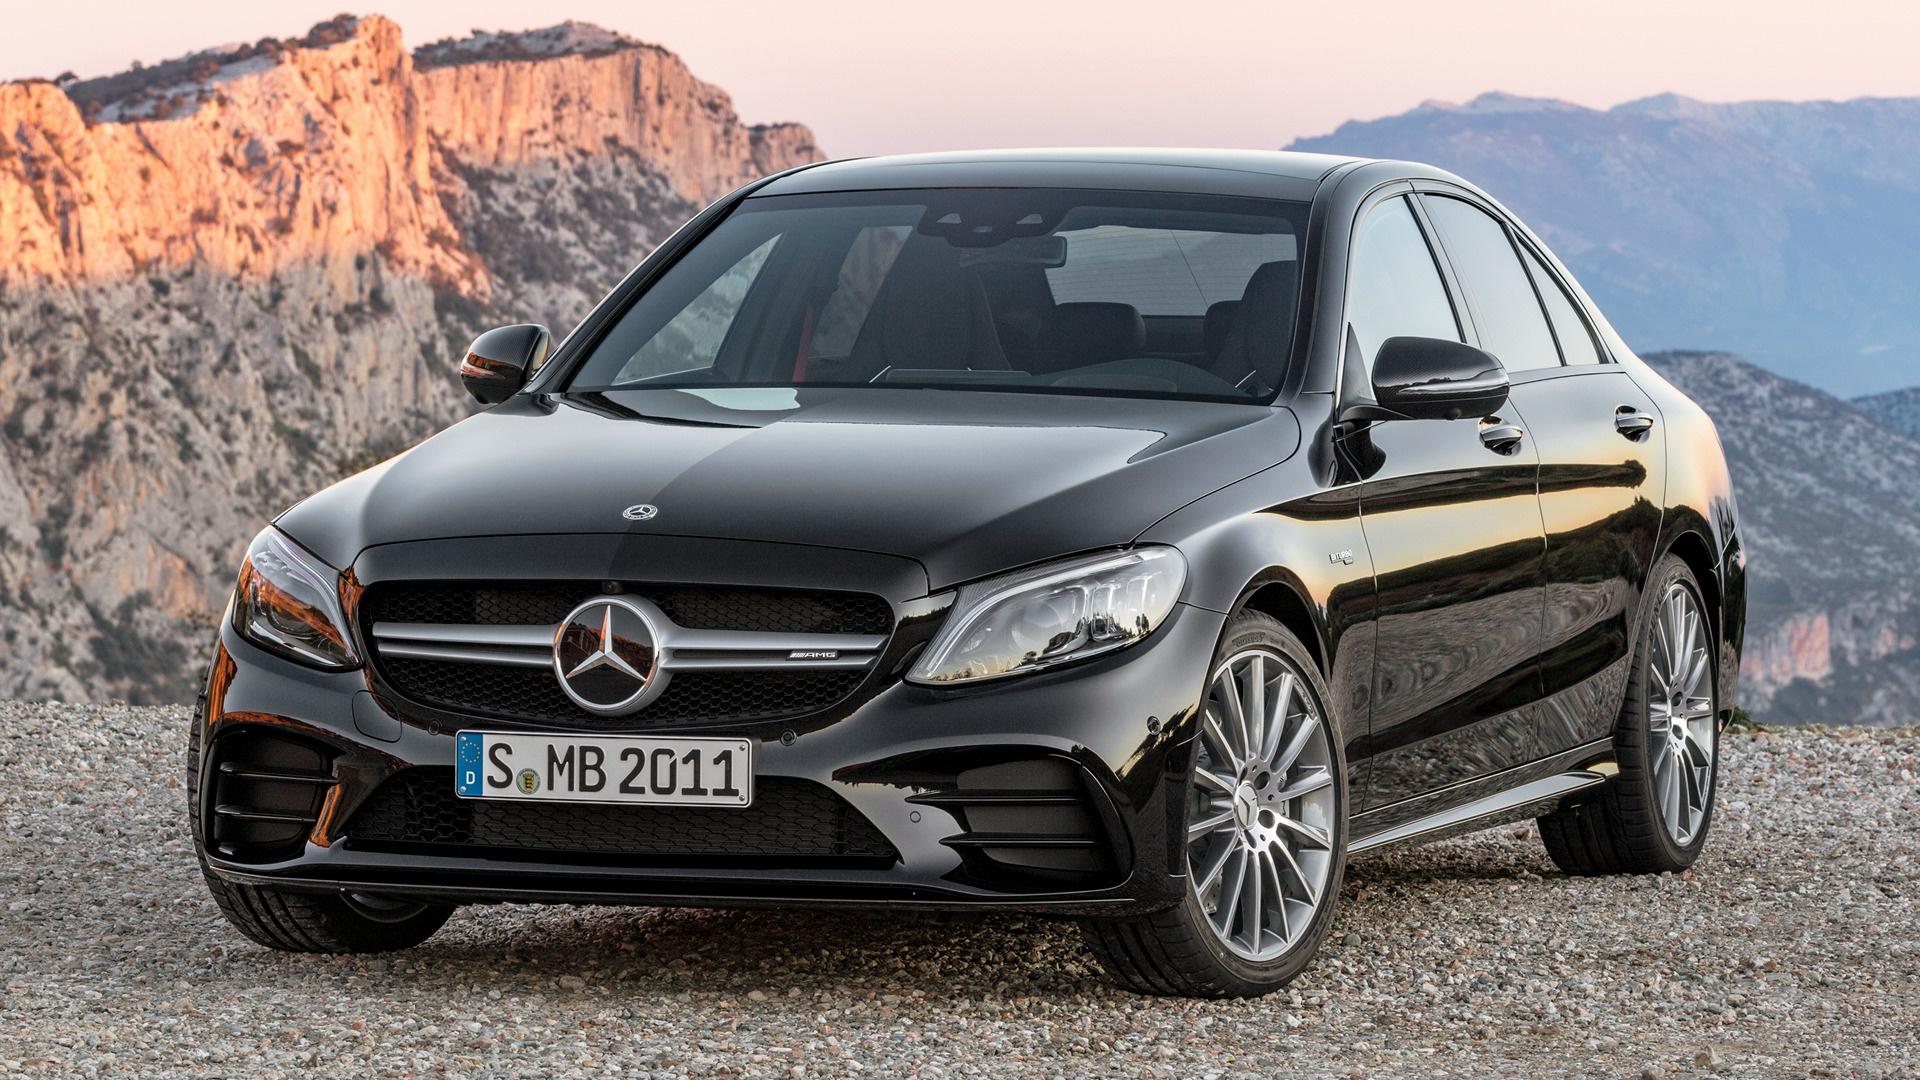 2018 Mercedes-AMG C 43 HD Wallpaper | Background Image ...